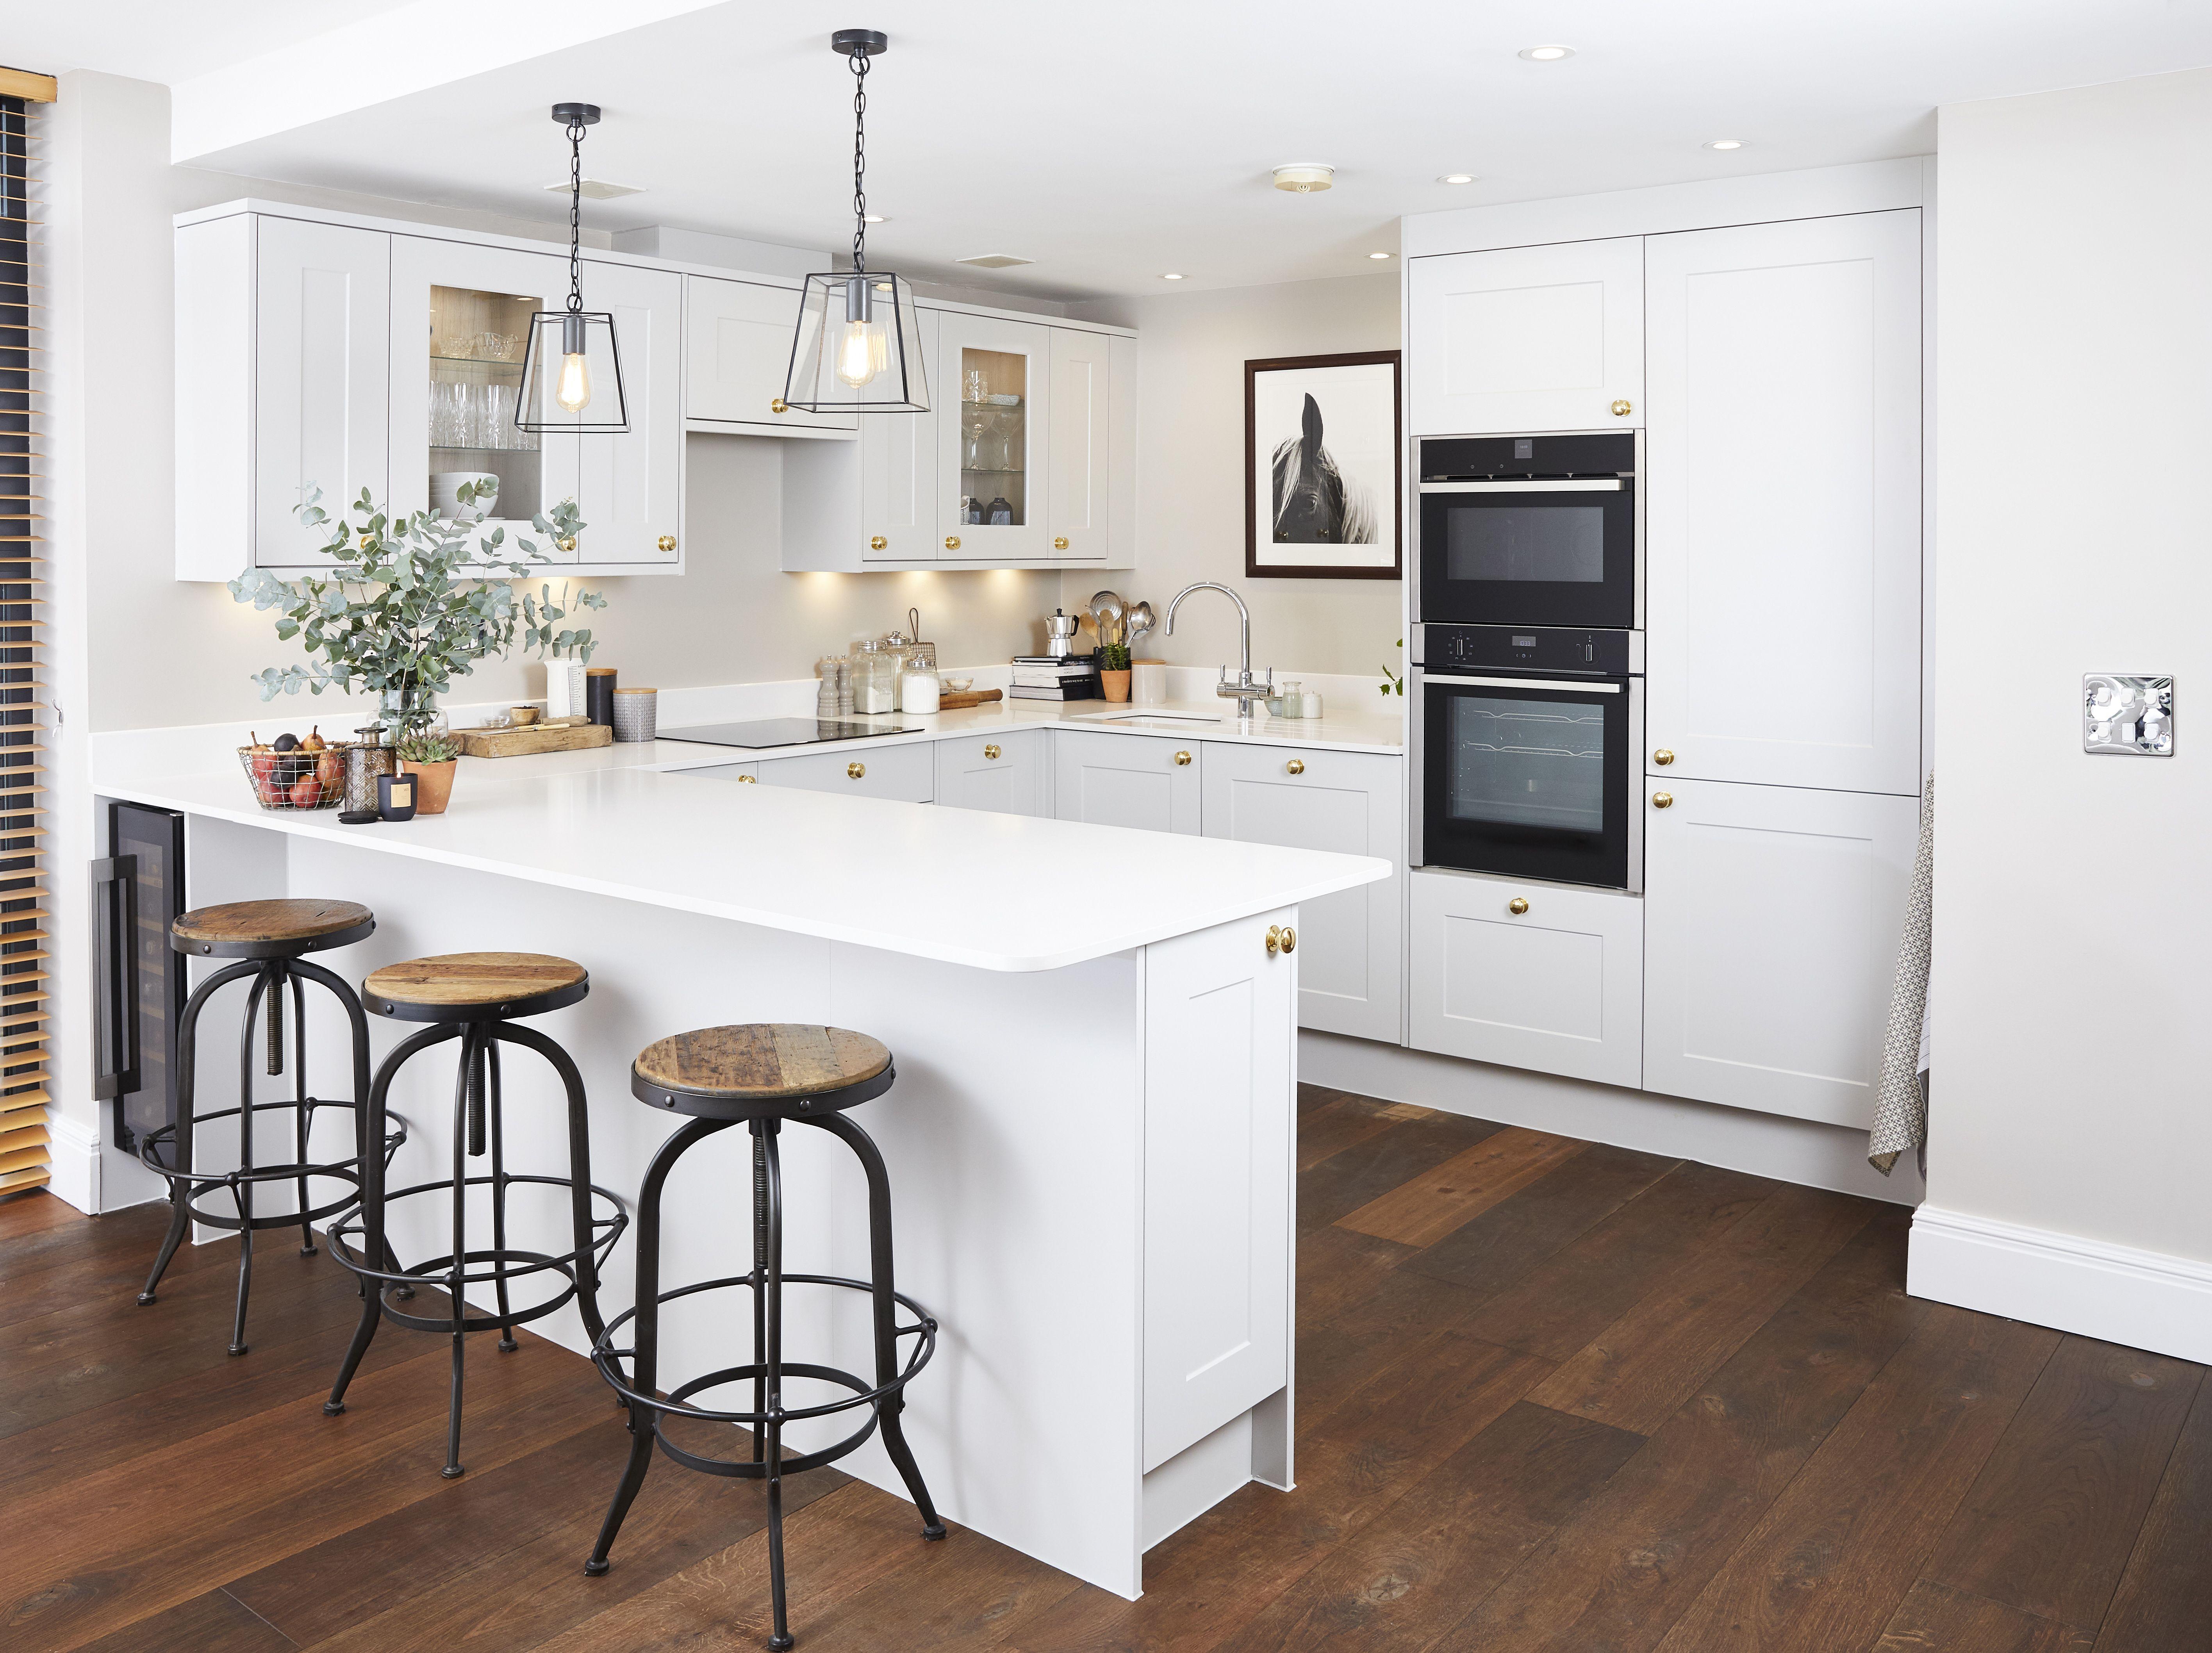 Mollie Kings Kitchen Makeover In 2020 Howdens Kitchens Kitchen